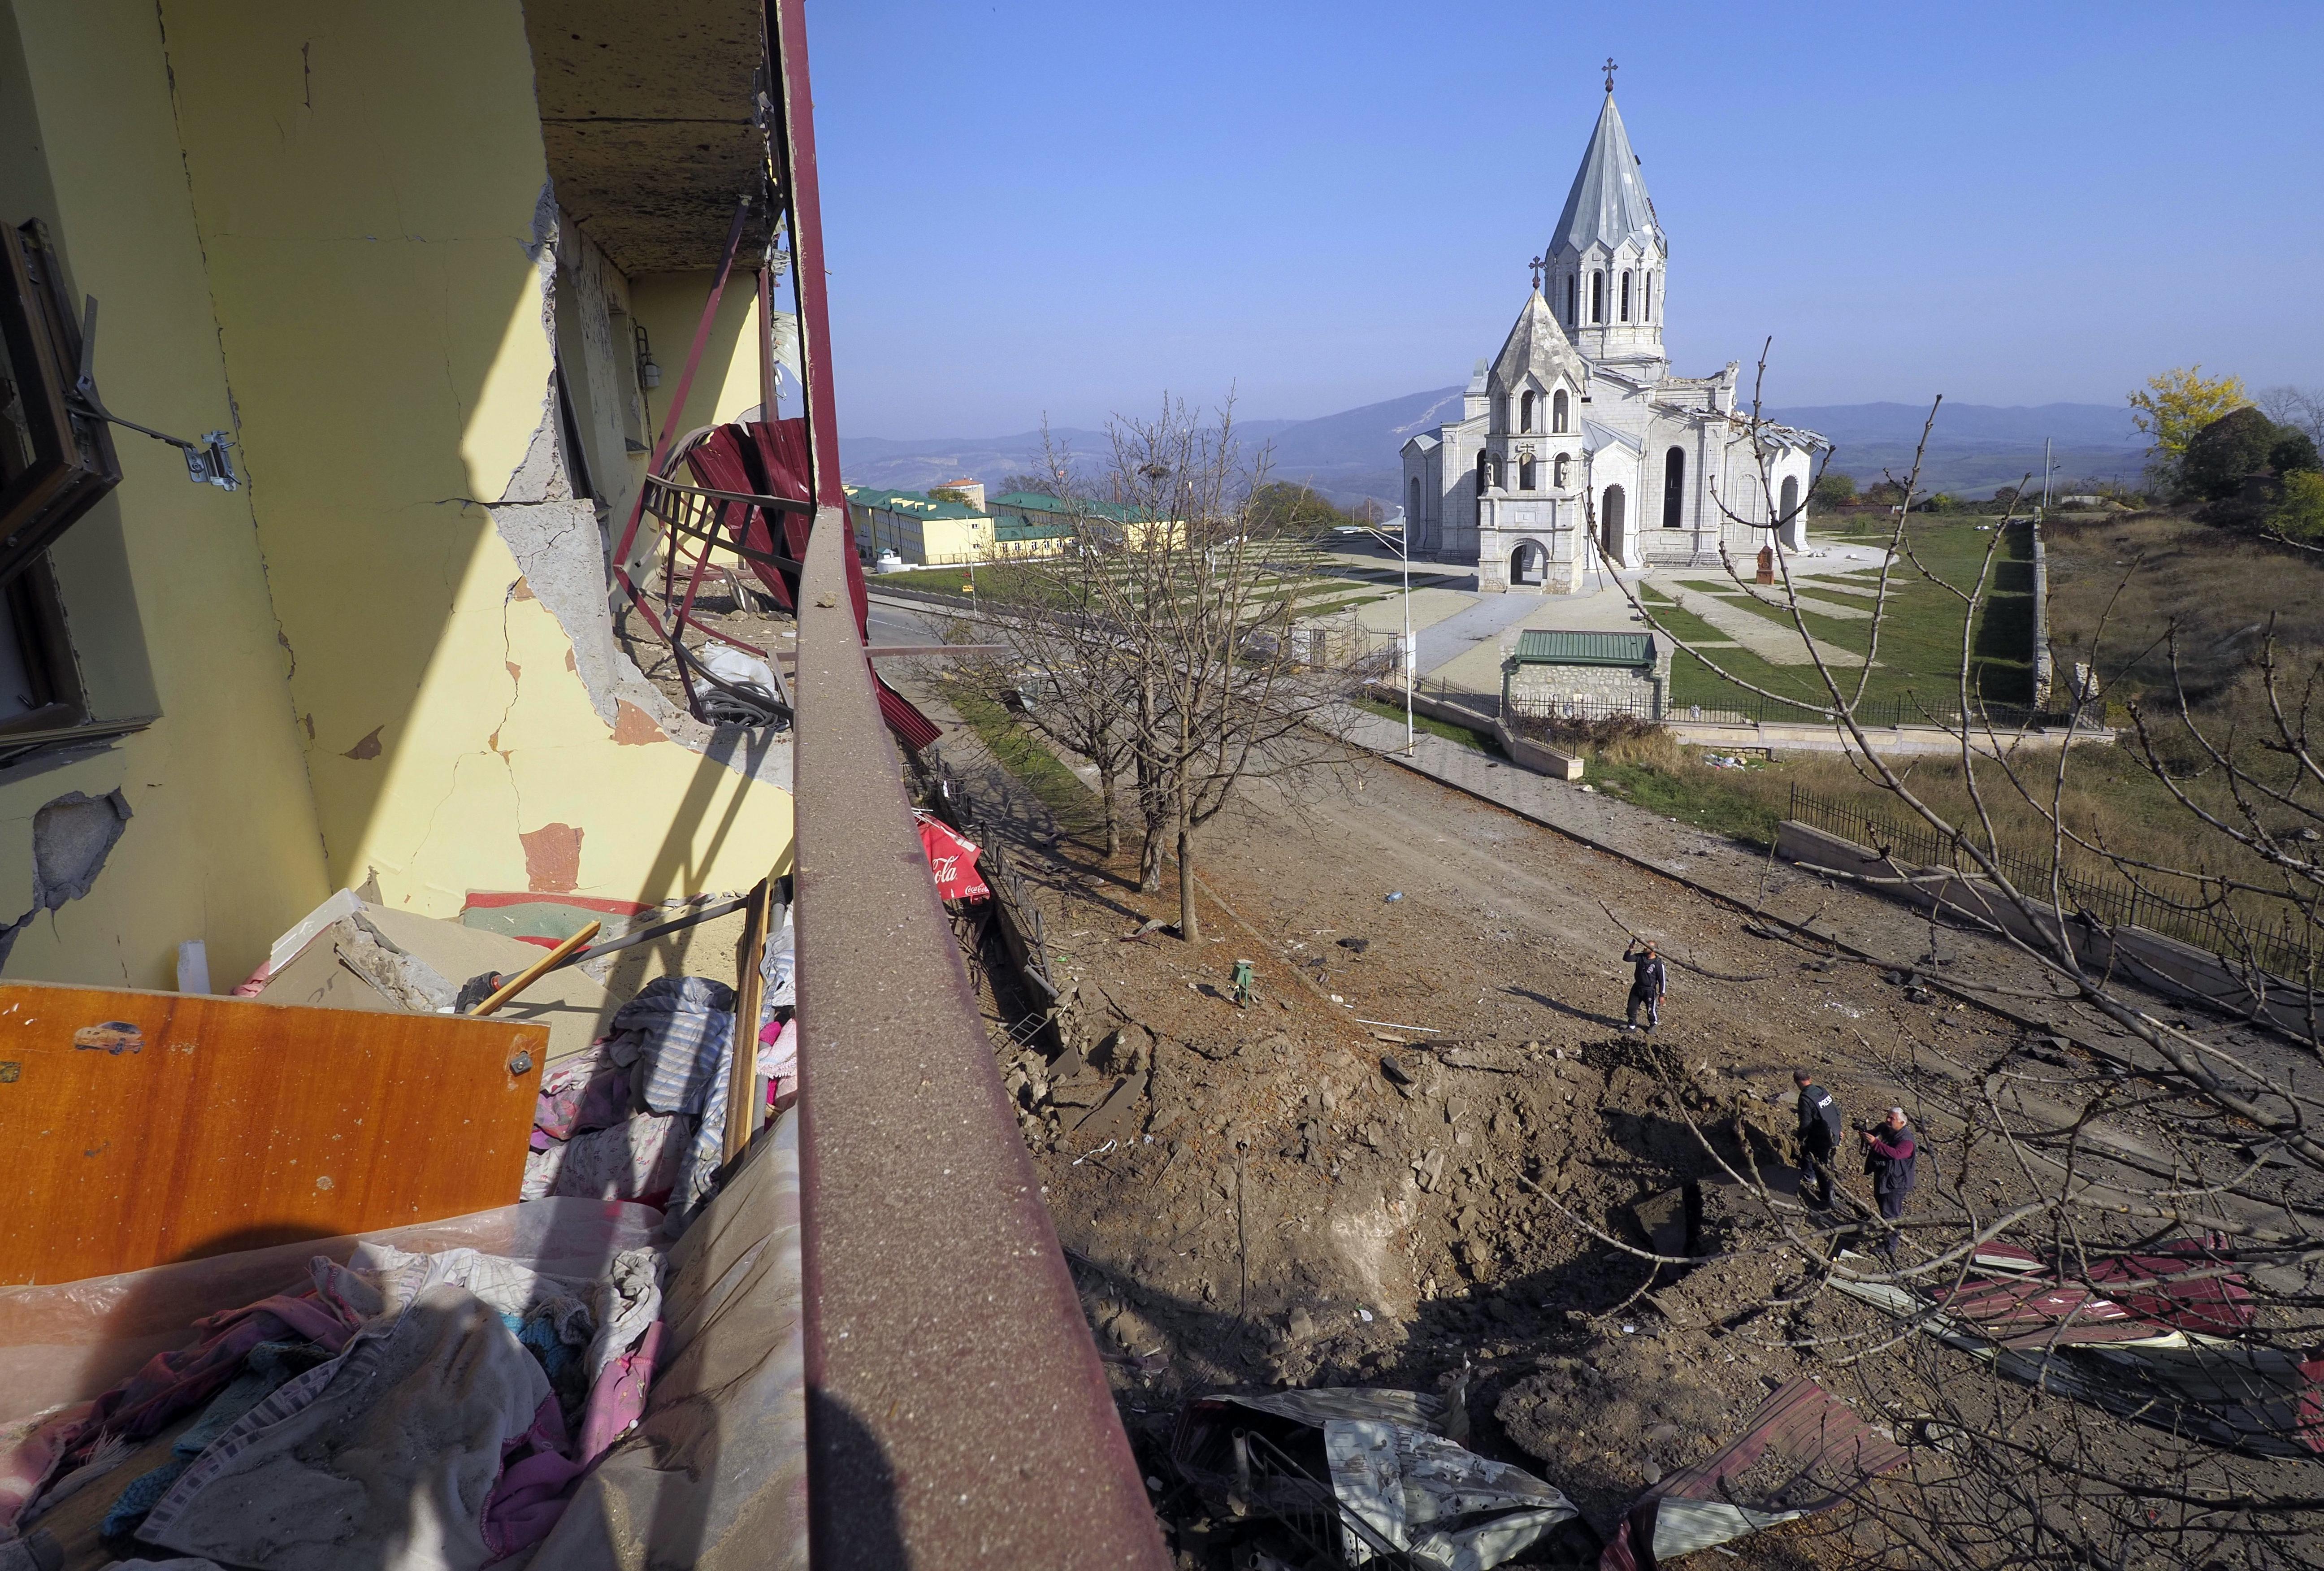 Azerbaijani forces close in on key town in Nagorno-Karabakh